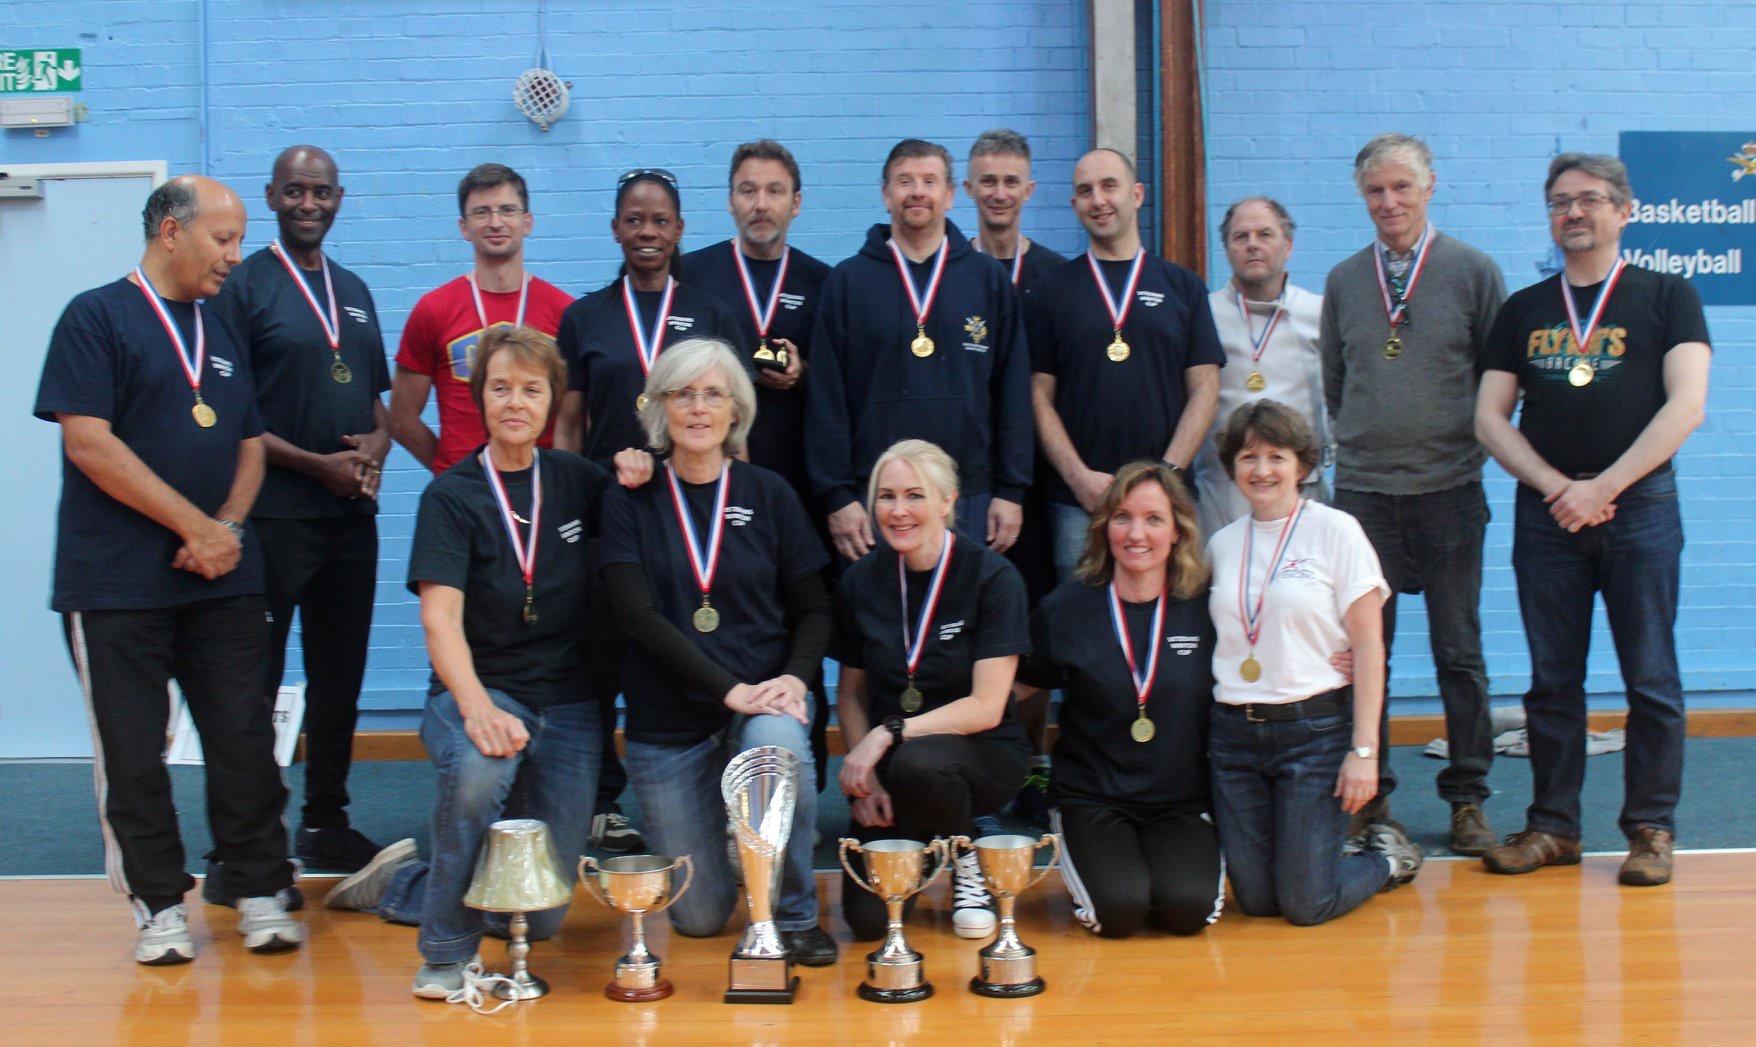 Winning Team, Vets Winton 2019